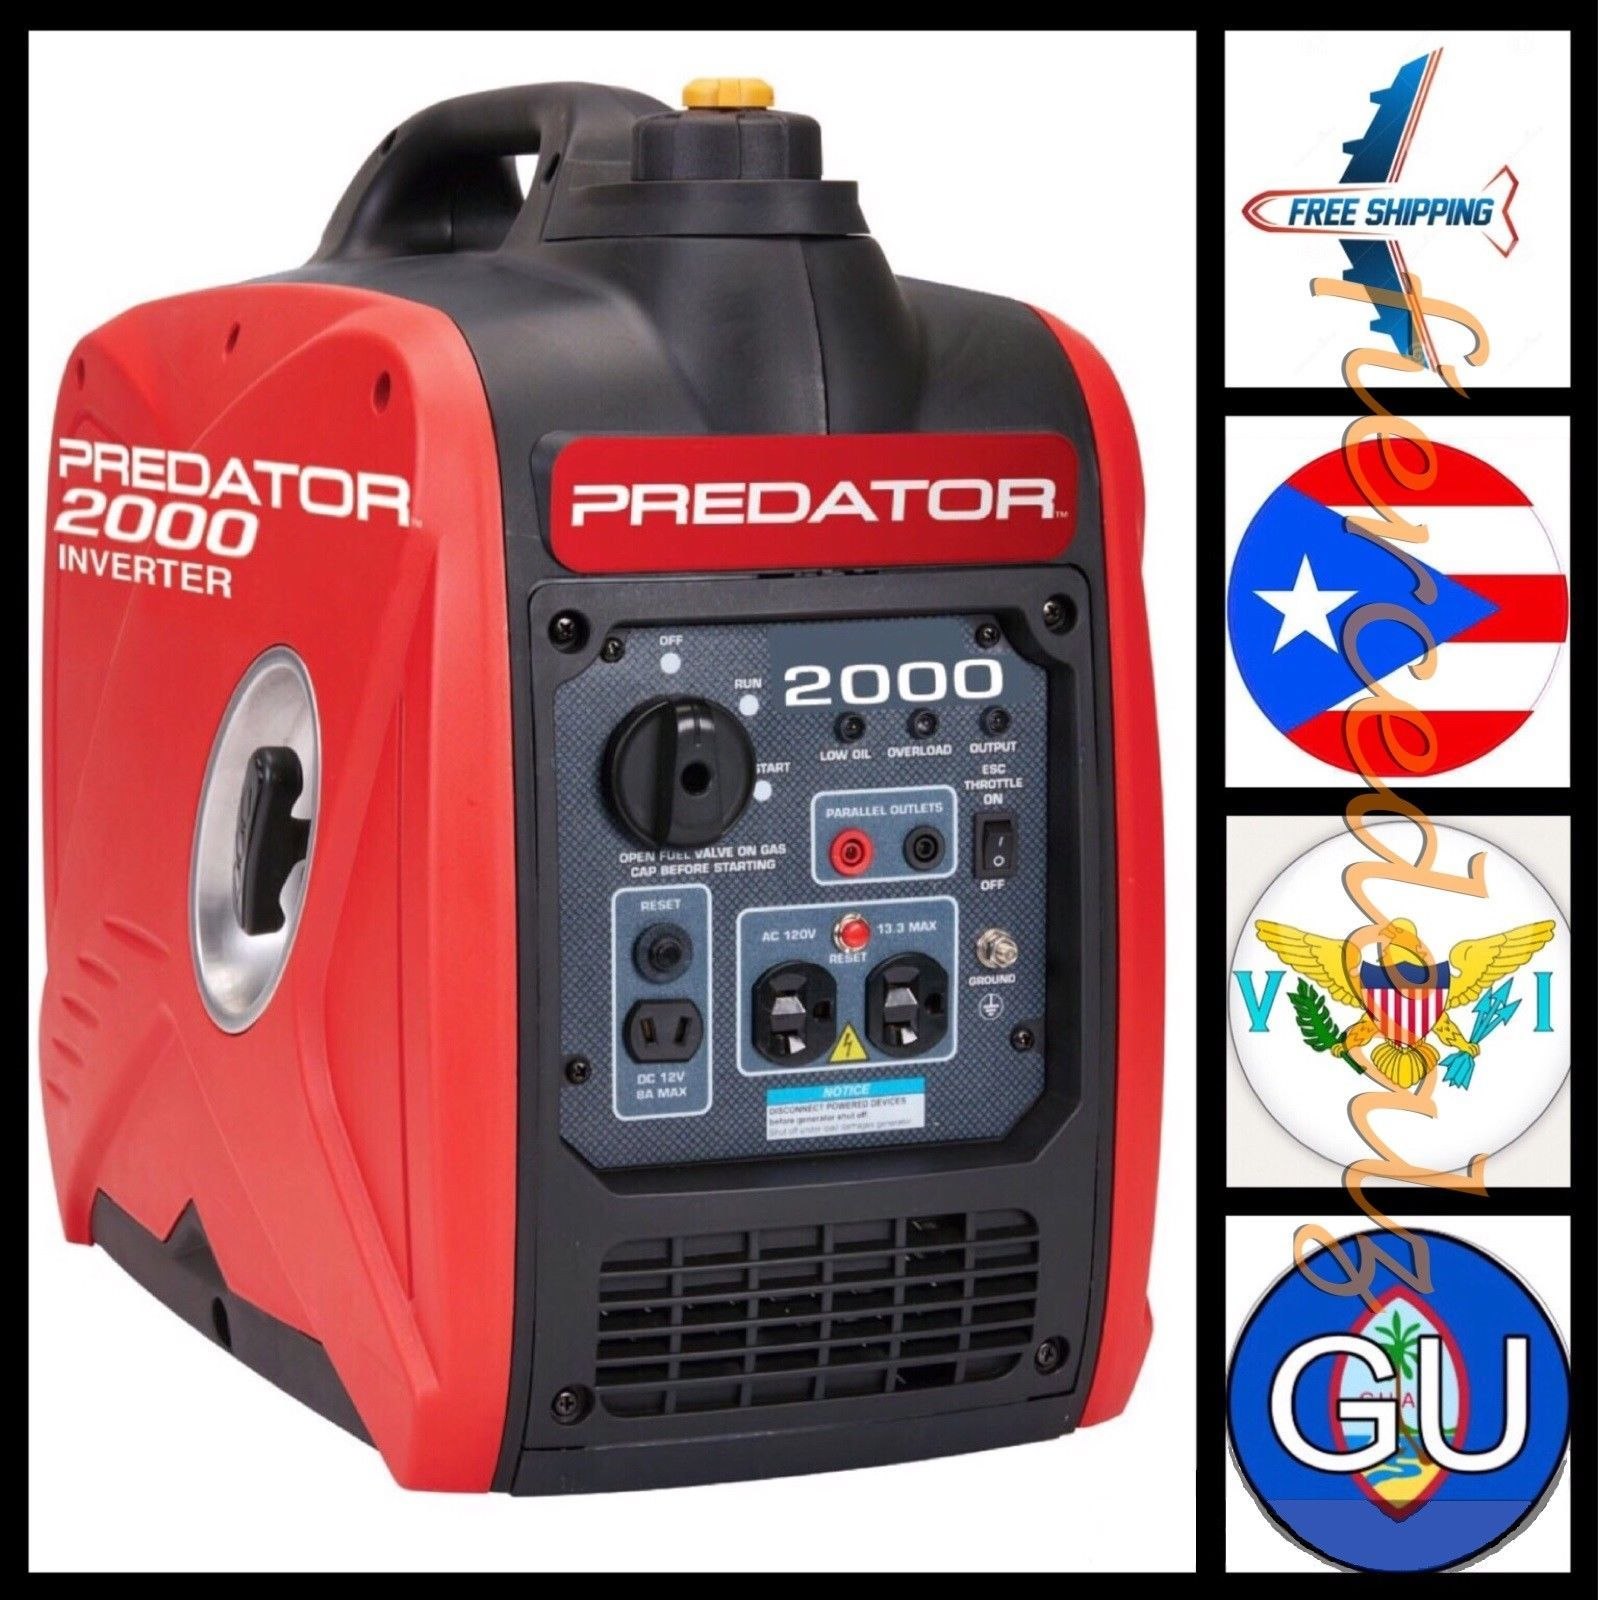 Predator 2000 Watt Generator Inverter Super Quiet Small Efficient